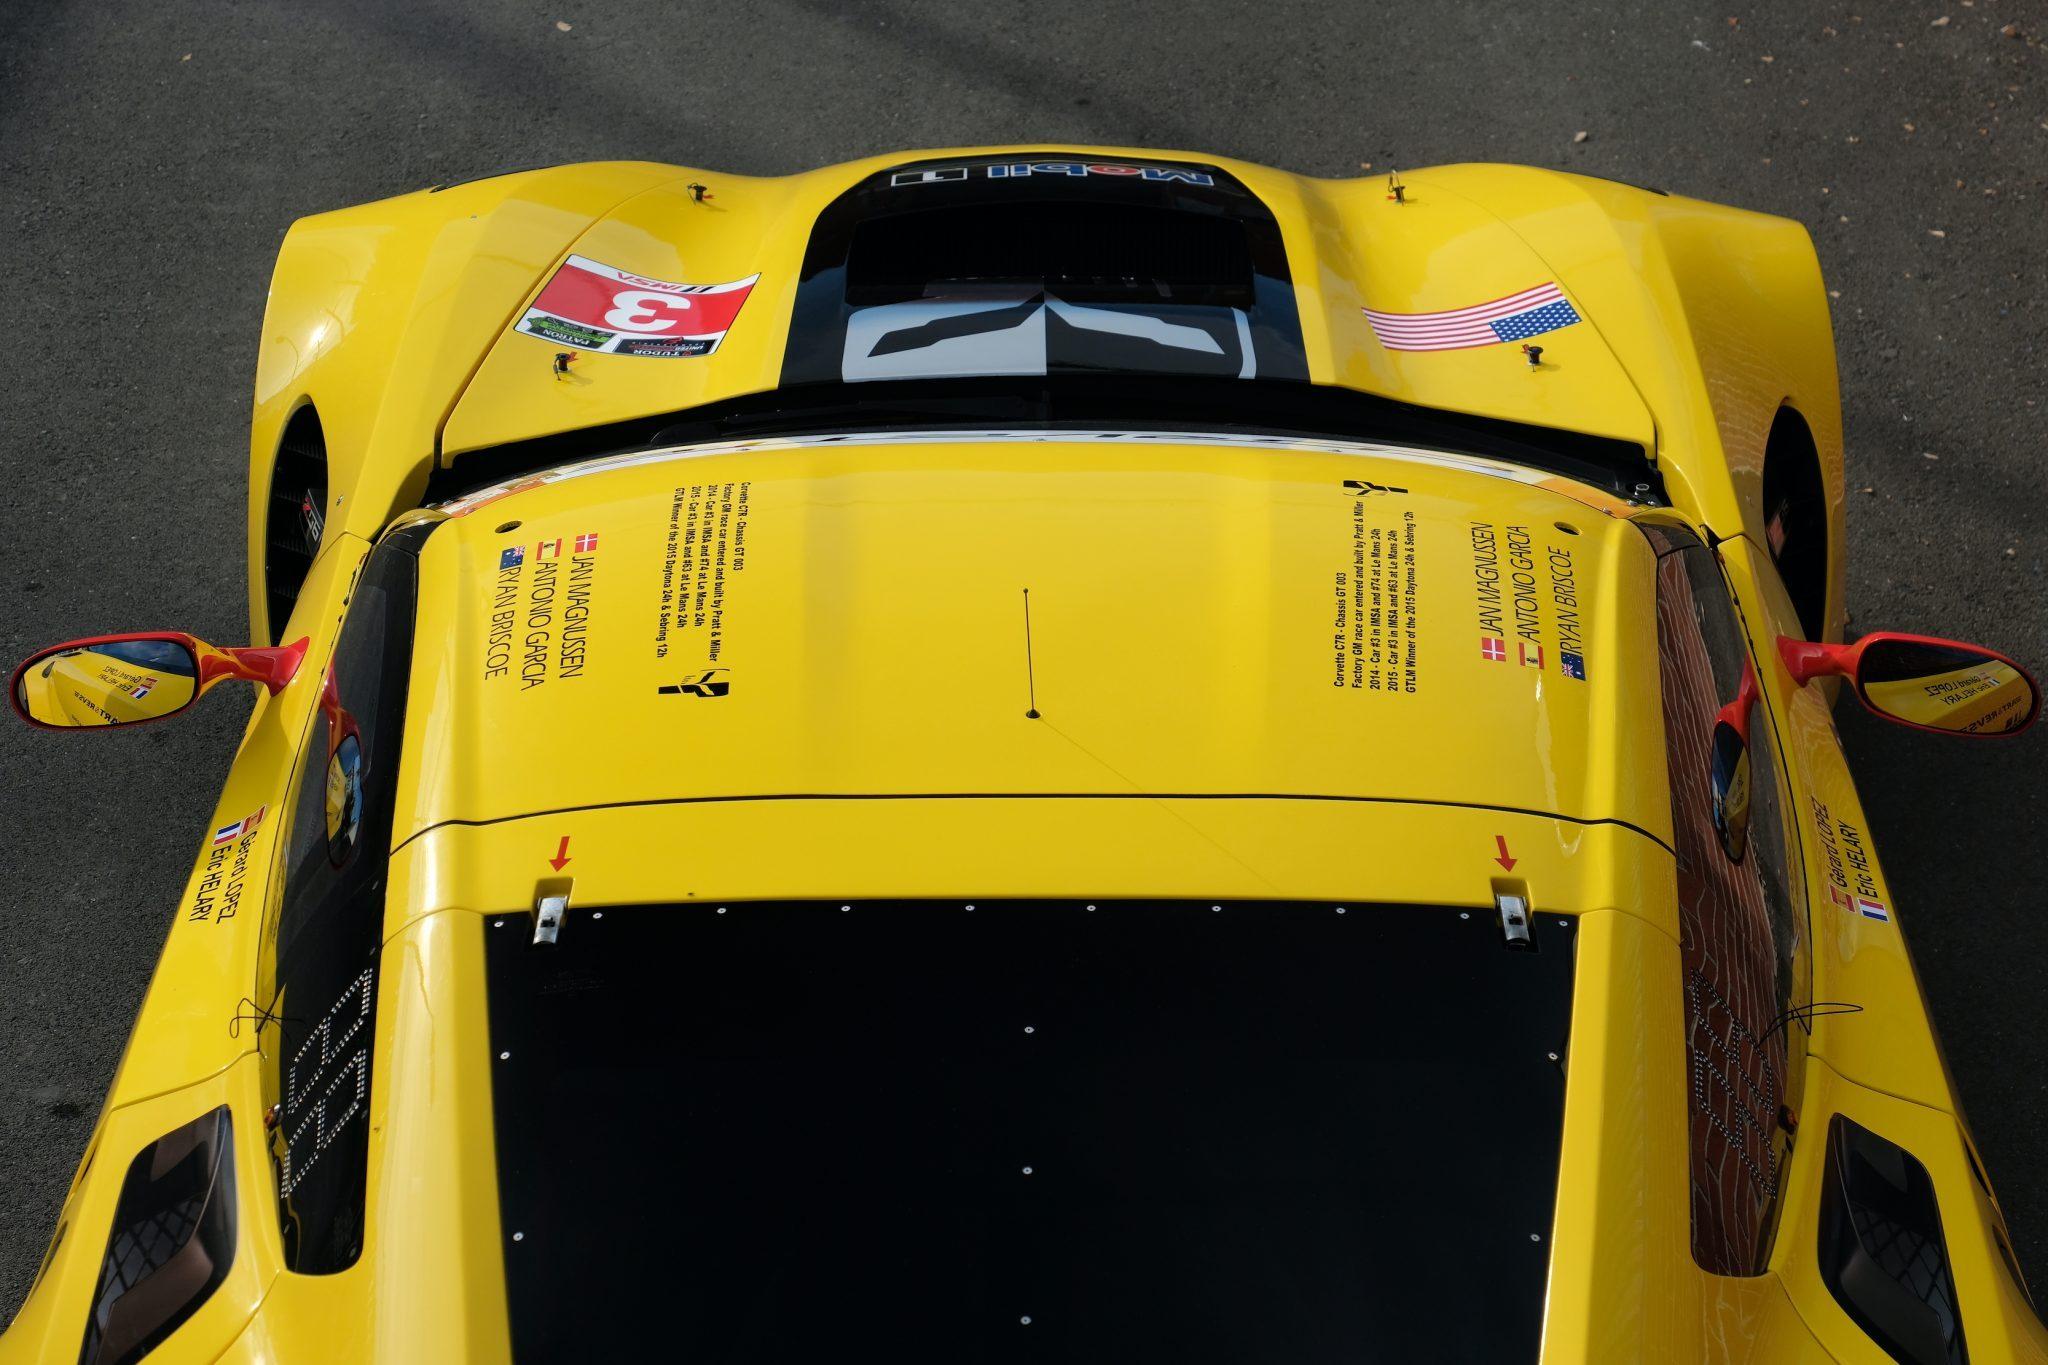 corvette c7.r overhead hood